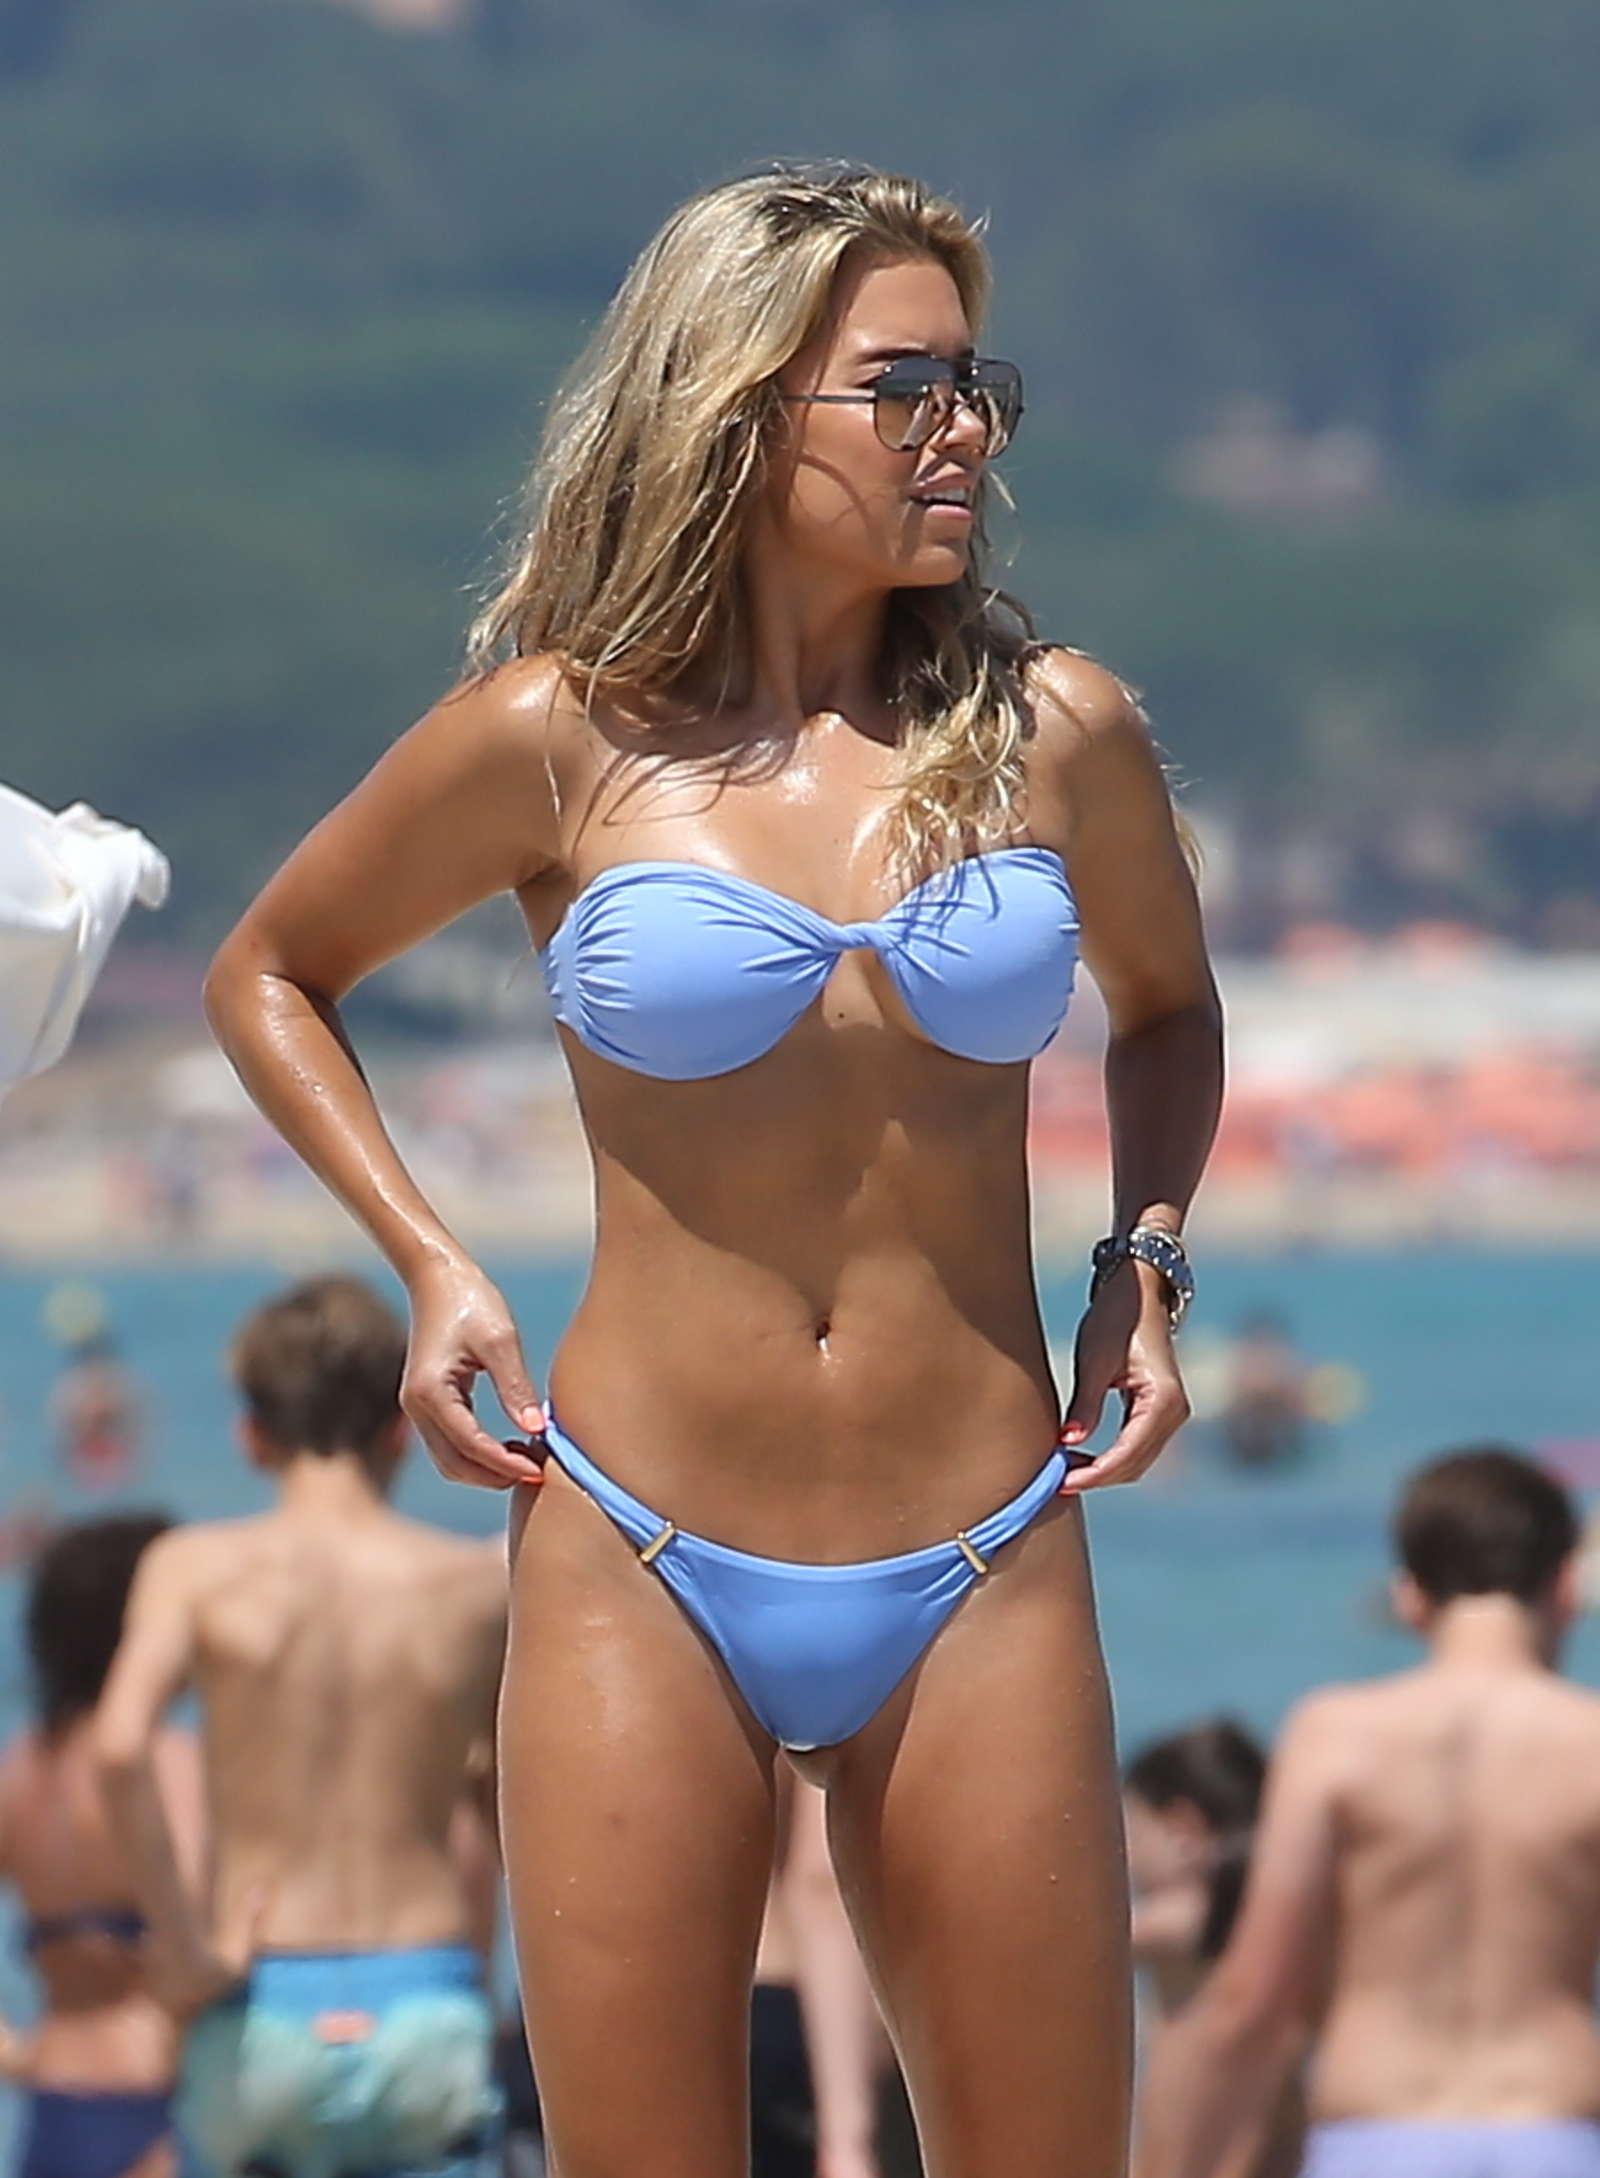 Karlina Caune nude (98 photos), Topless, Sideboobs, Boobs, butt 2020